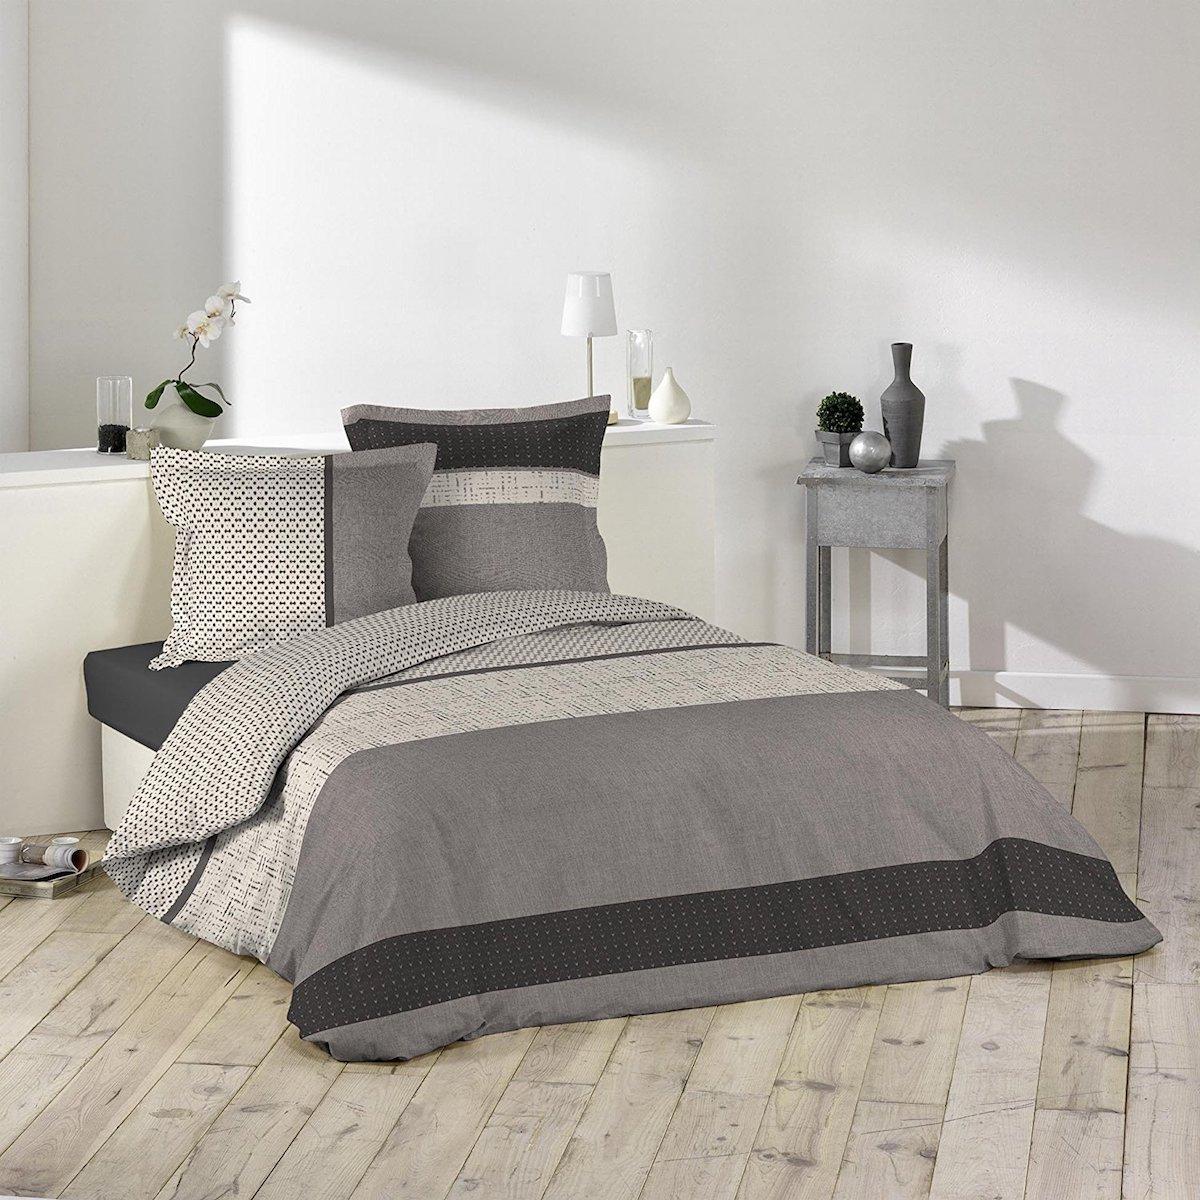 dezente lorenzo von douceur d 39 int rieur bettw sche. Black Bedroom Furniture Sets. Home Design Ideas